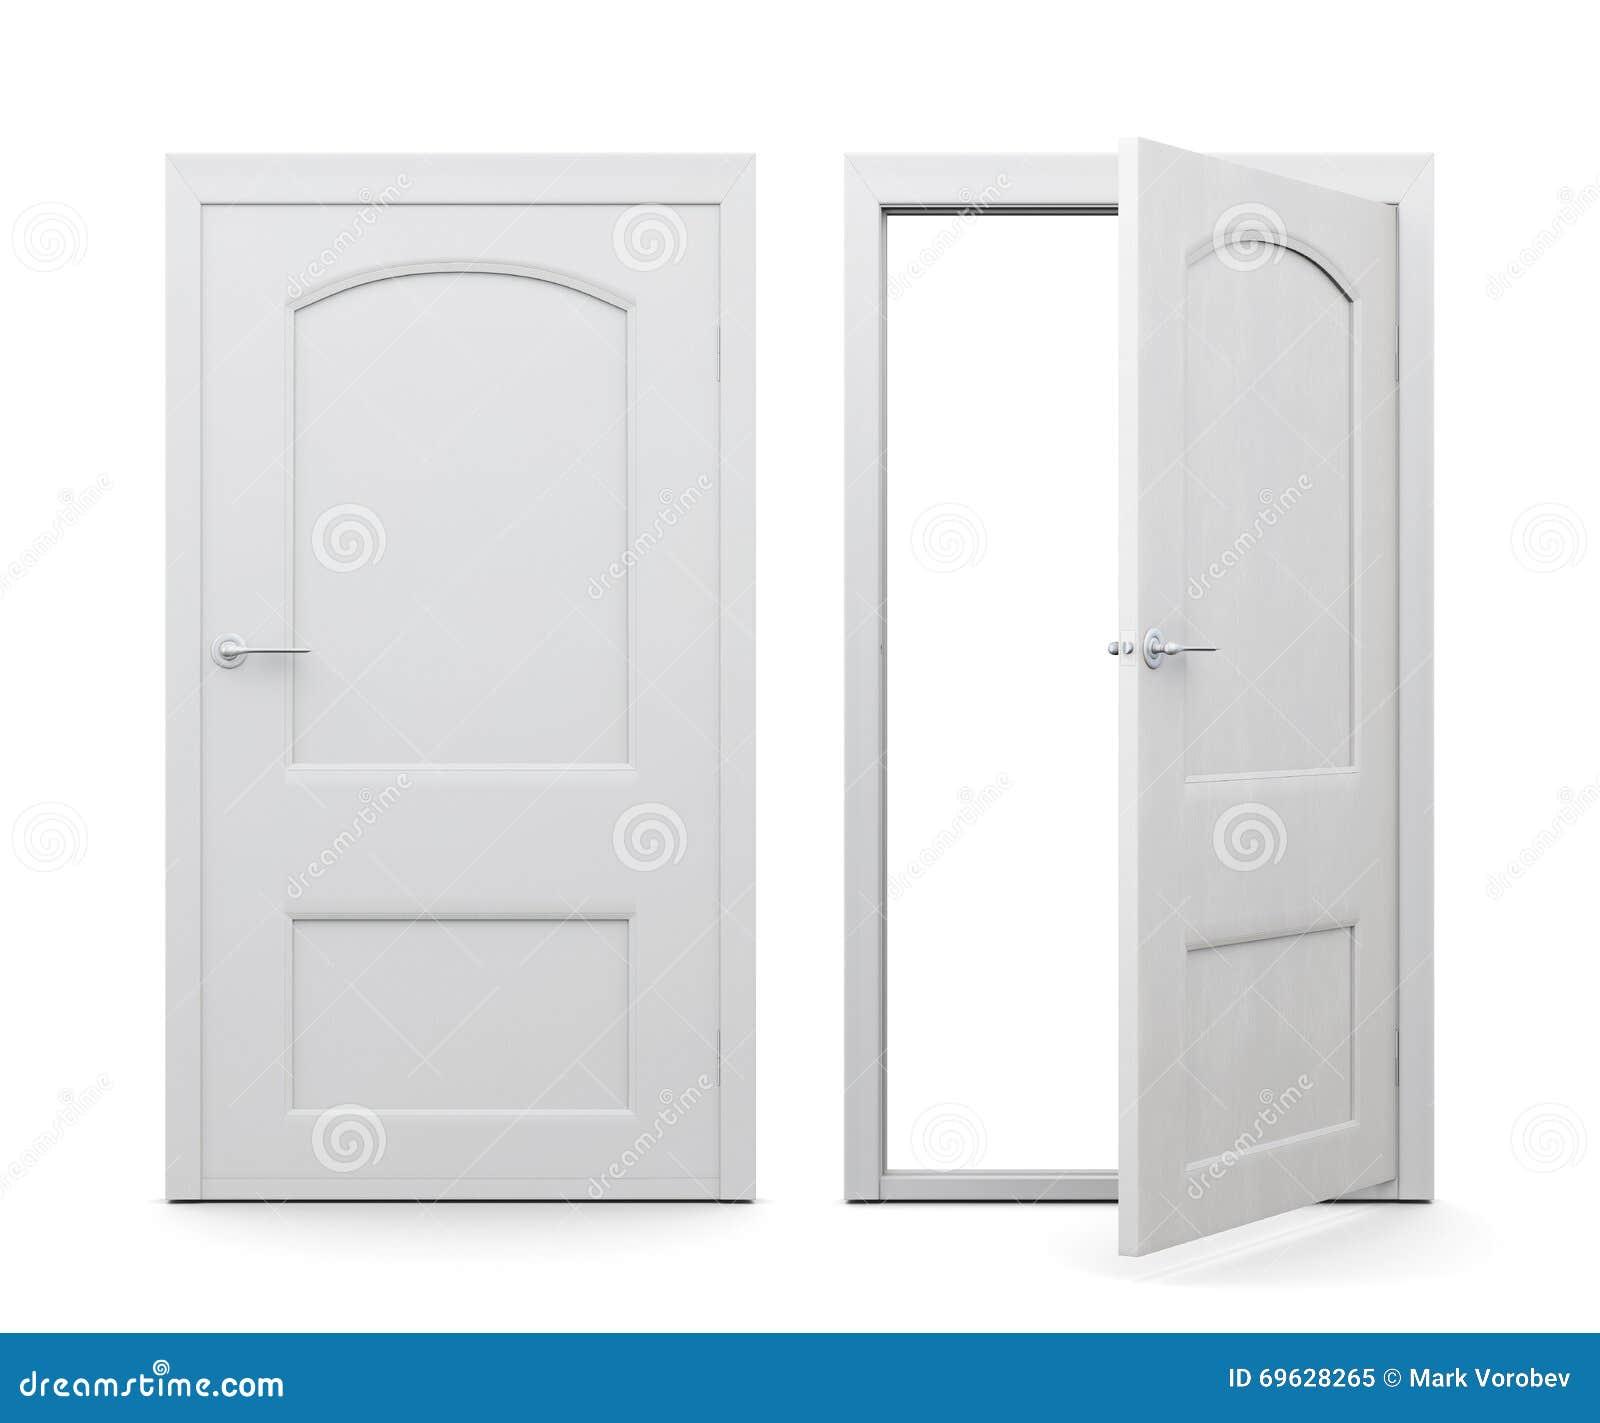 Open And Closed Doors : Open and closed doors on white background d rendering